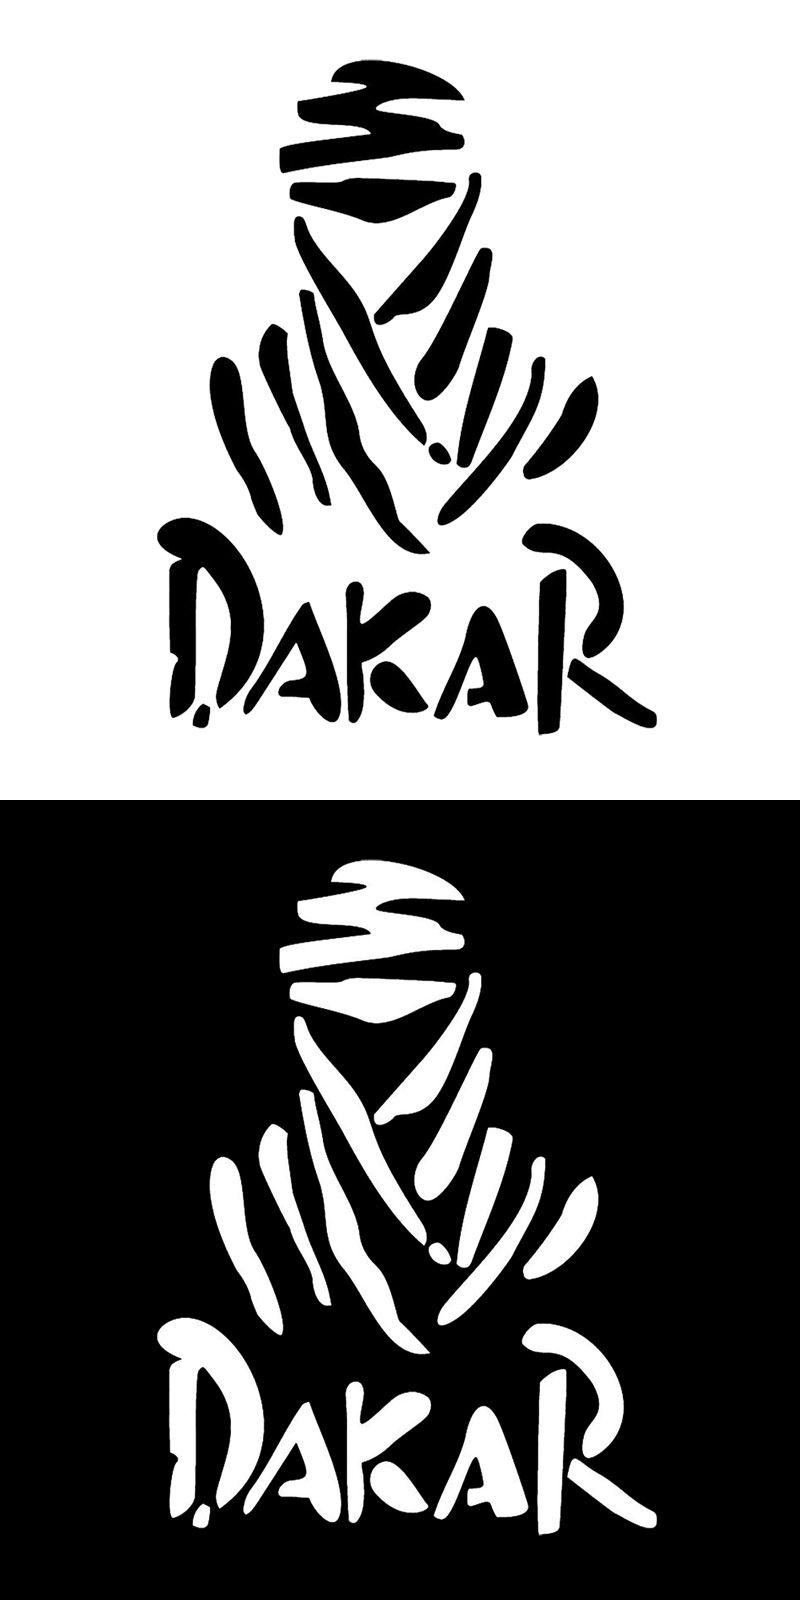 11 415 4cm dakar paris rally race logo car window decal vinyl car sticker c1 4000